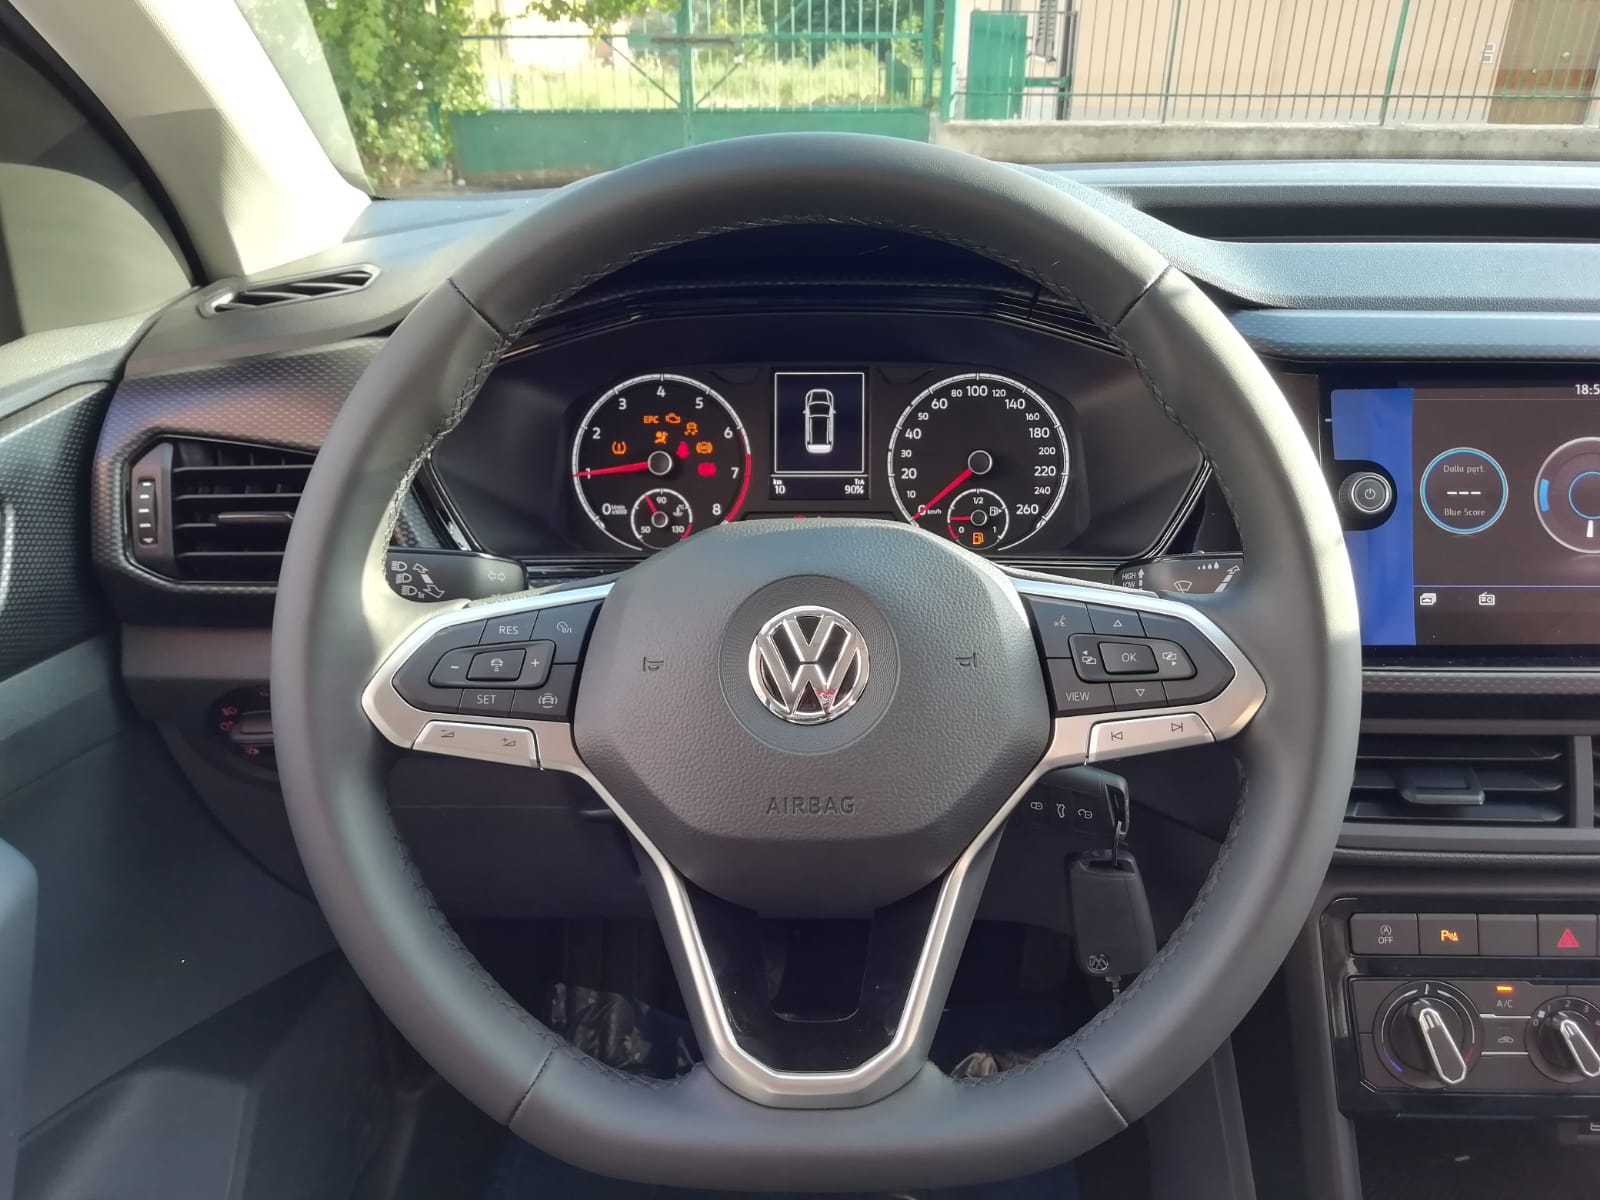 Volkswagen T-Cross 1.0 TSI 95 cv Style